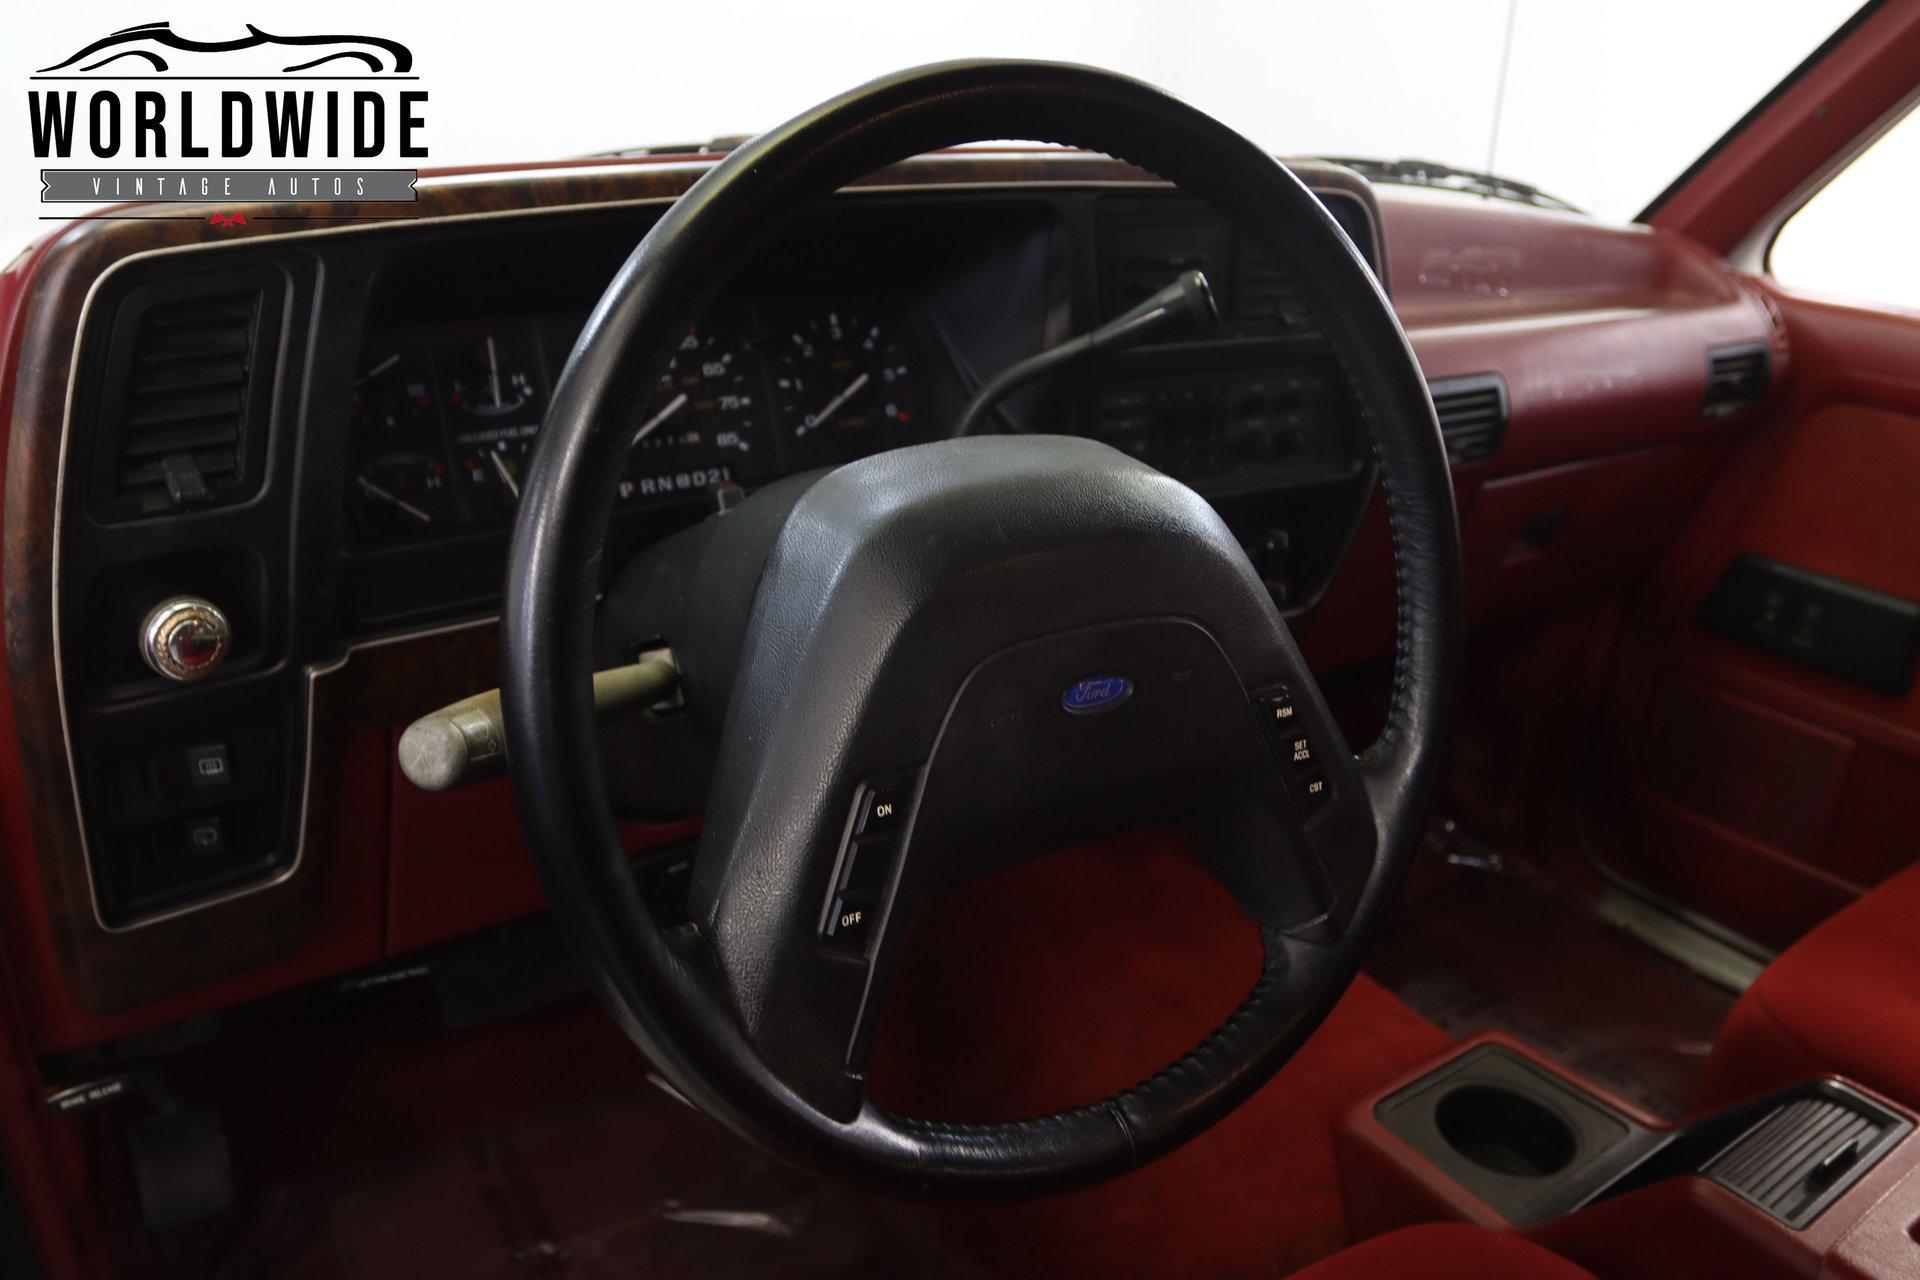 1989 Ford Bronco II